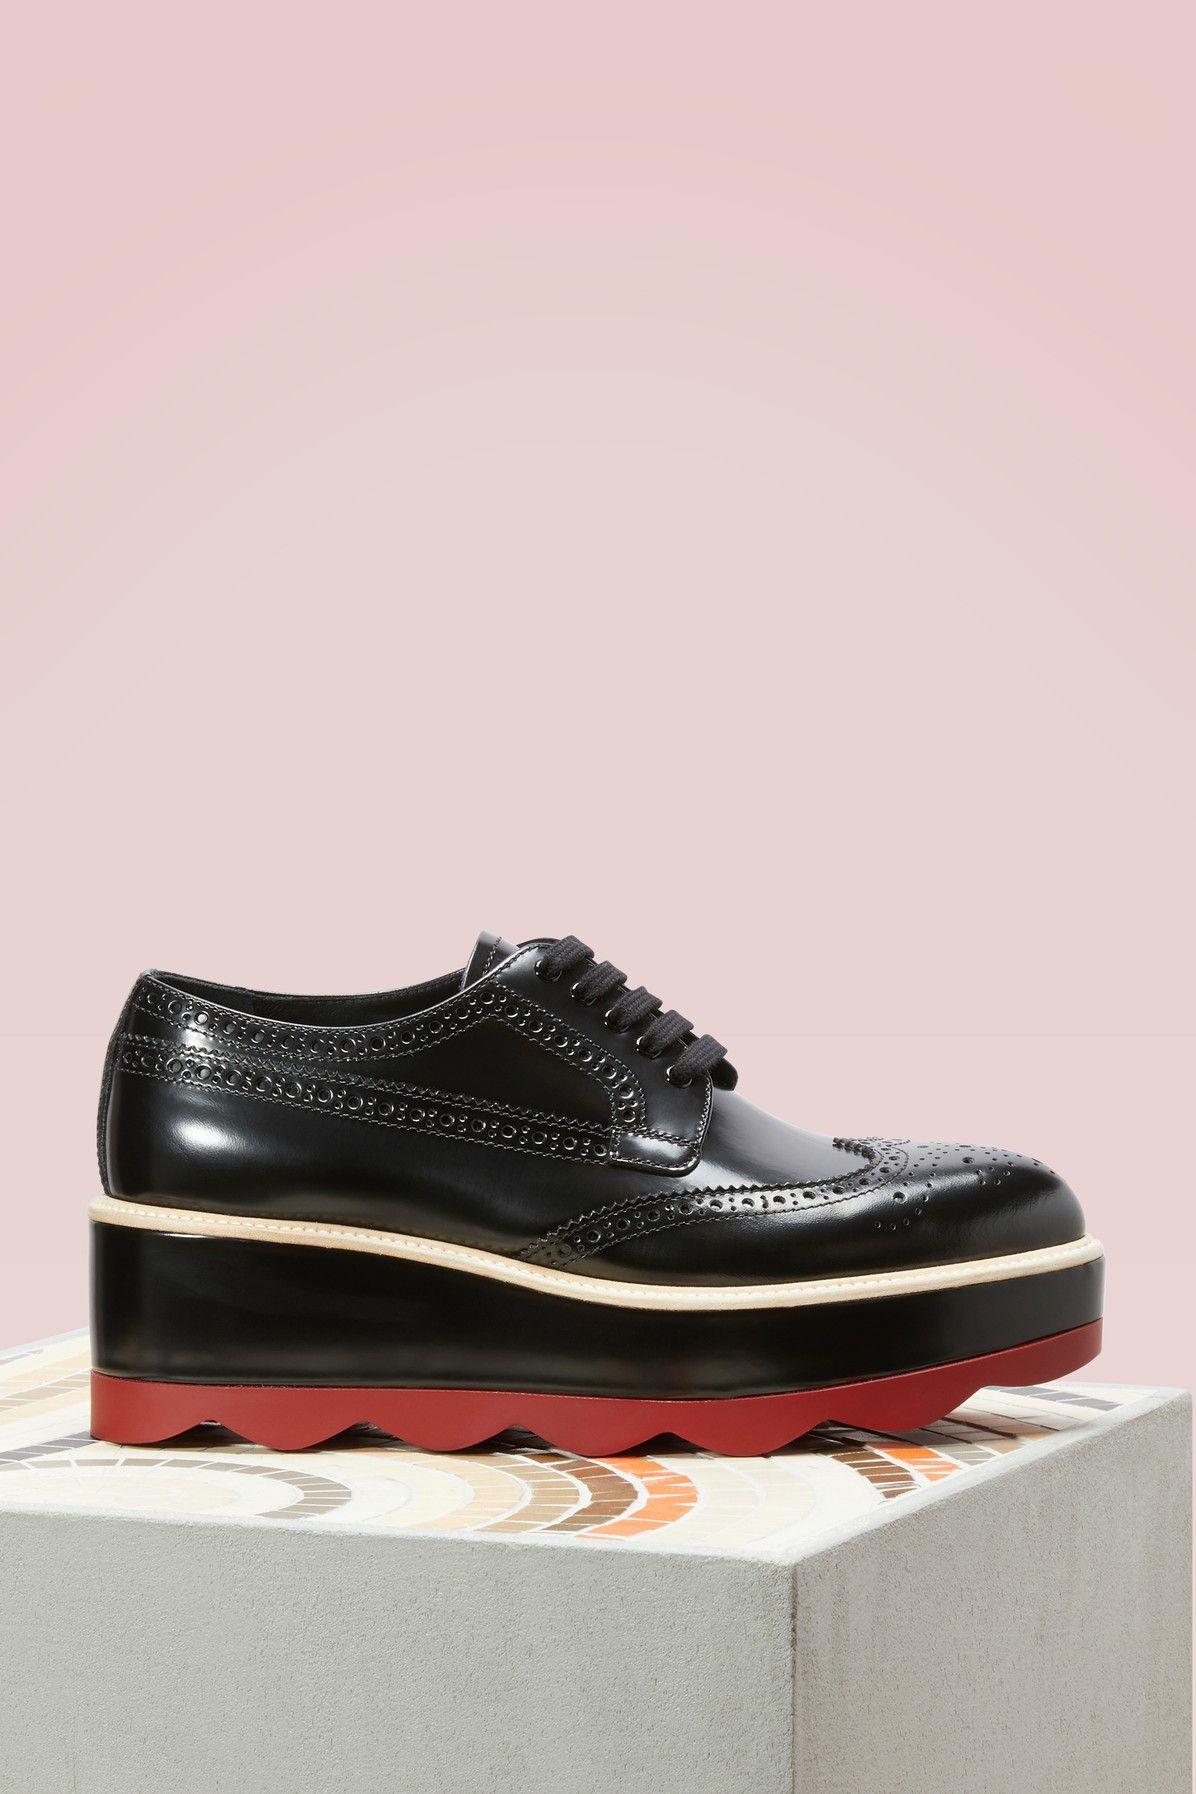 a8c4b1b88cf PRADA Red sole derbies.  prada  shoes